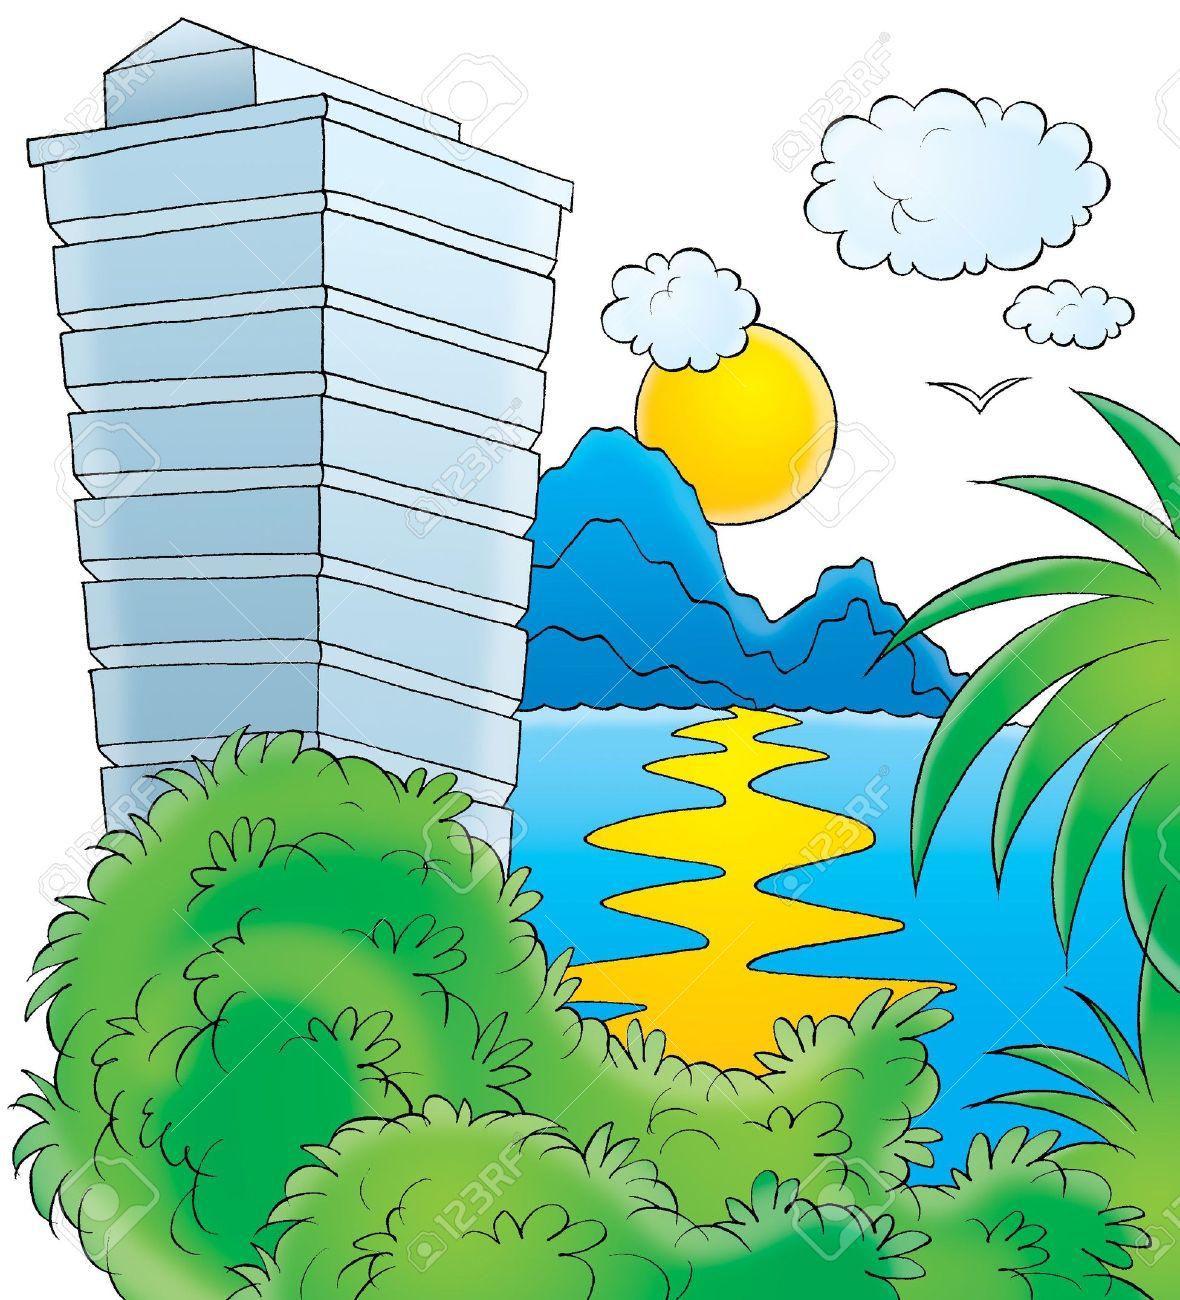 Free Resorts Cliparts, Download Free Clip Art, Free Clip Art.